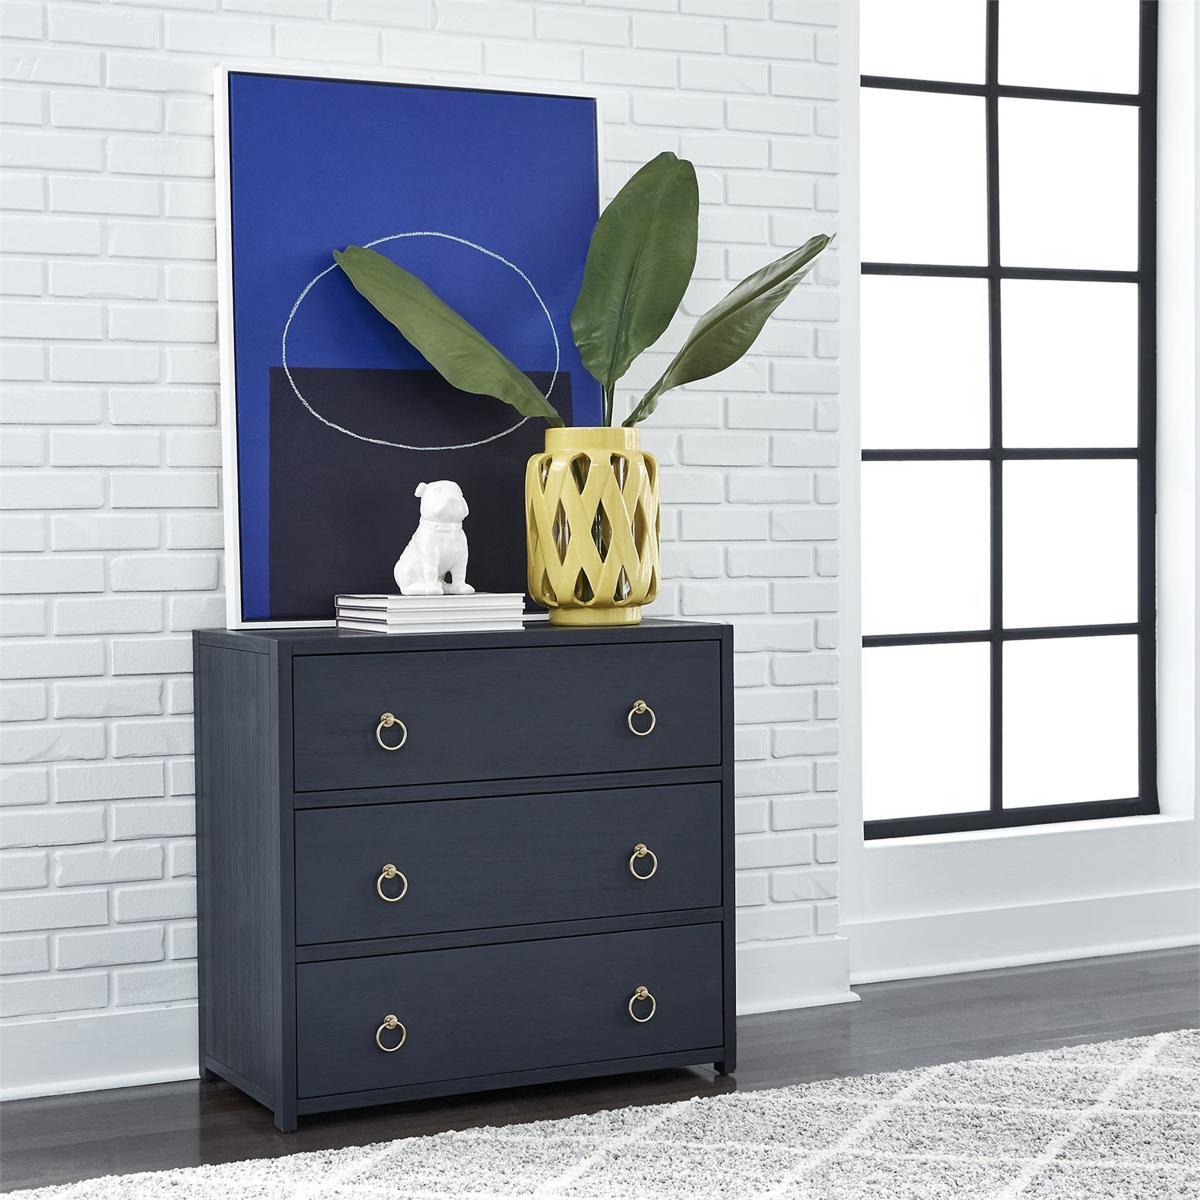 Stylish Hallway with Blue Hallway Cabinet